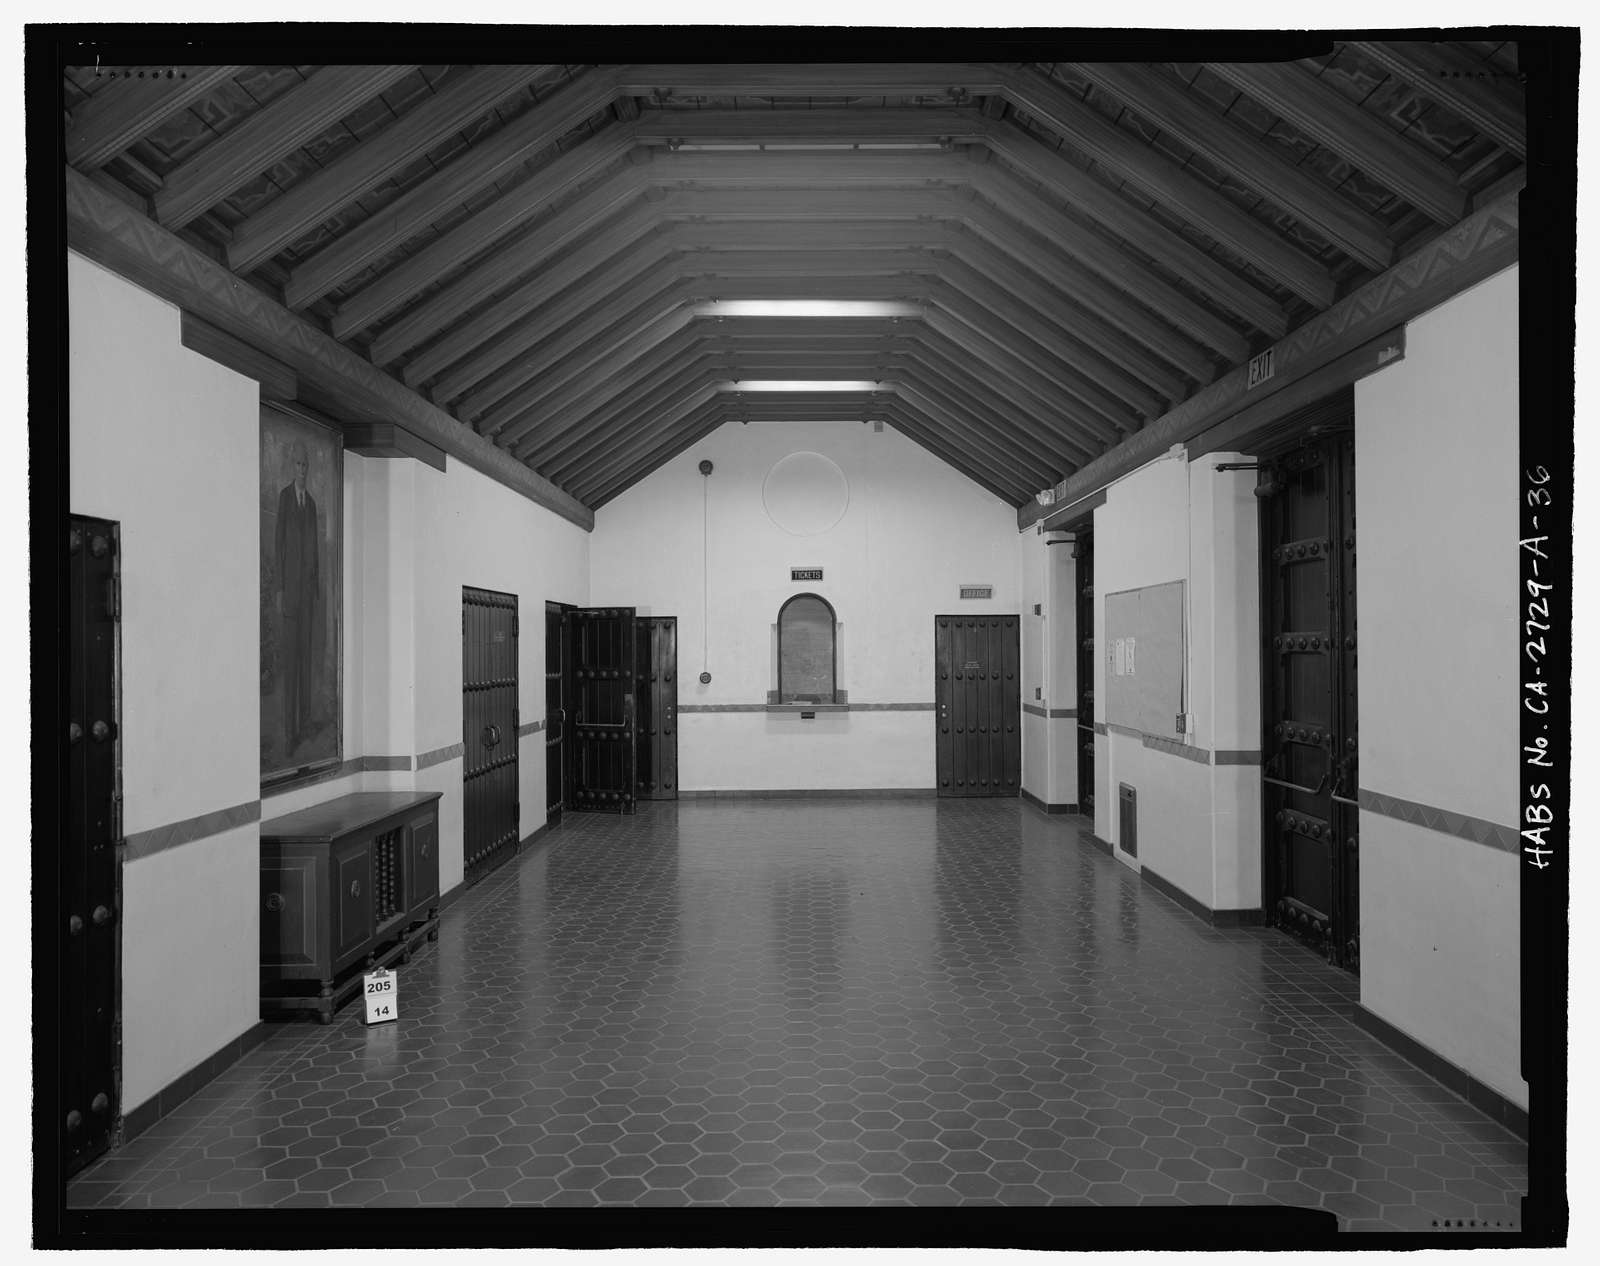 San Bernardino Valley College, Auditorium, 701 South Mount Vernon Avenue, San Bernardino, San Bernardino County, CA